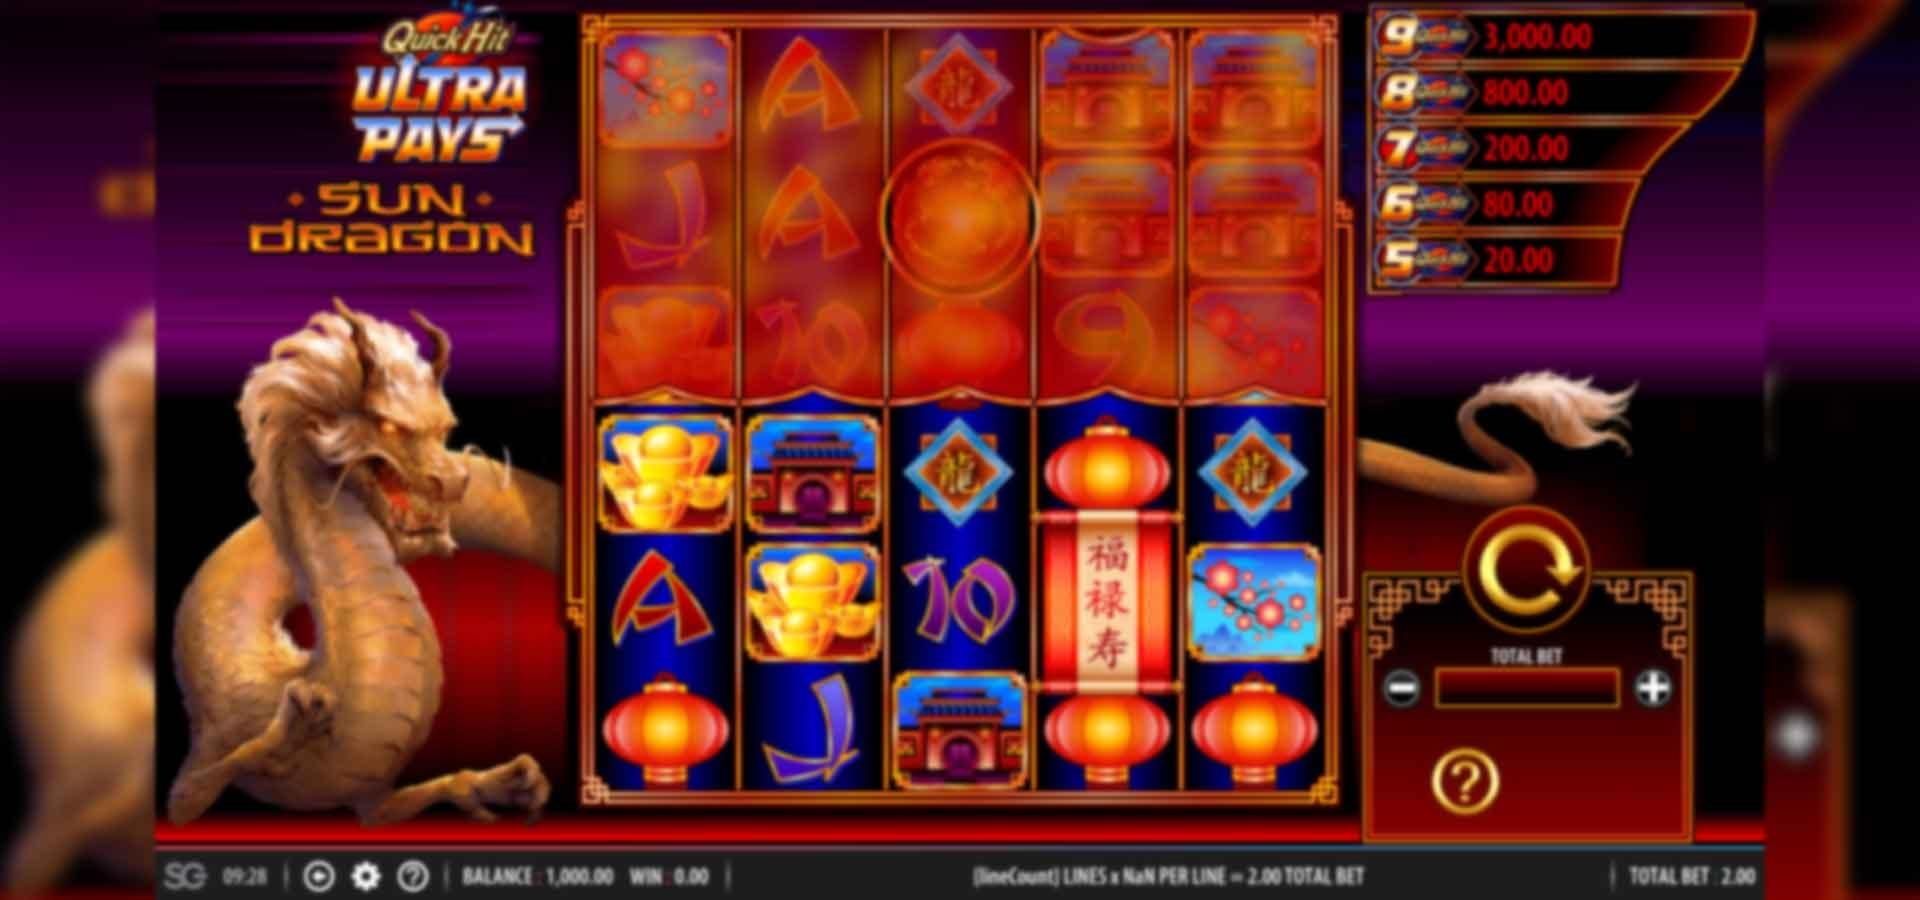 EURO 4565 No deposit bonus casino at Dunder Casino